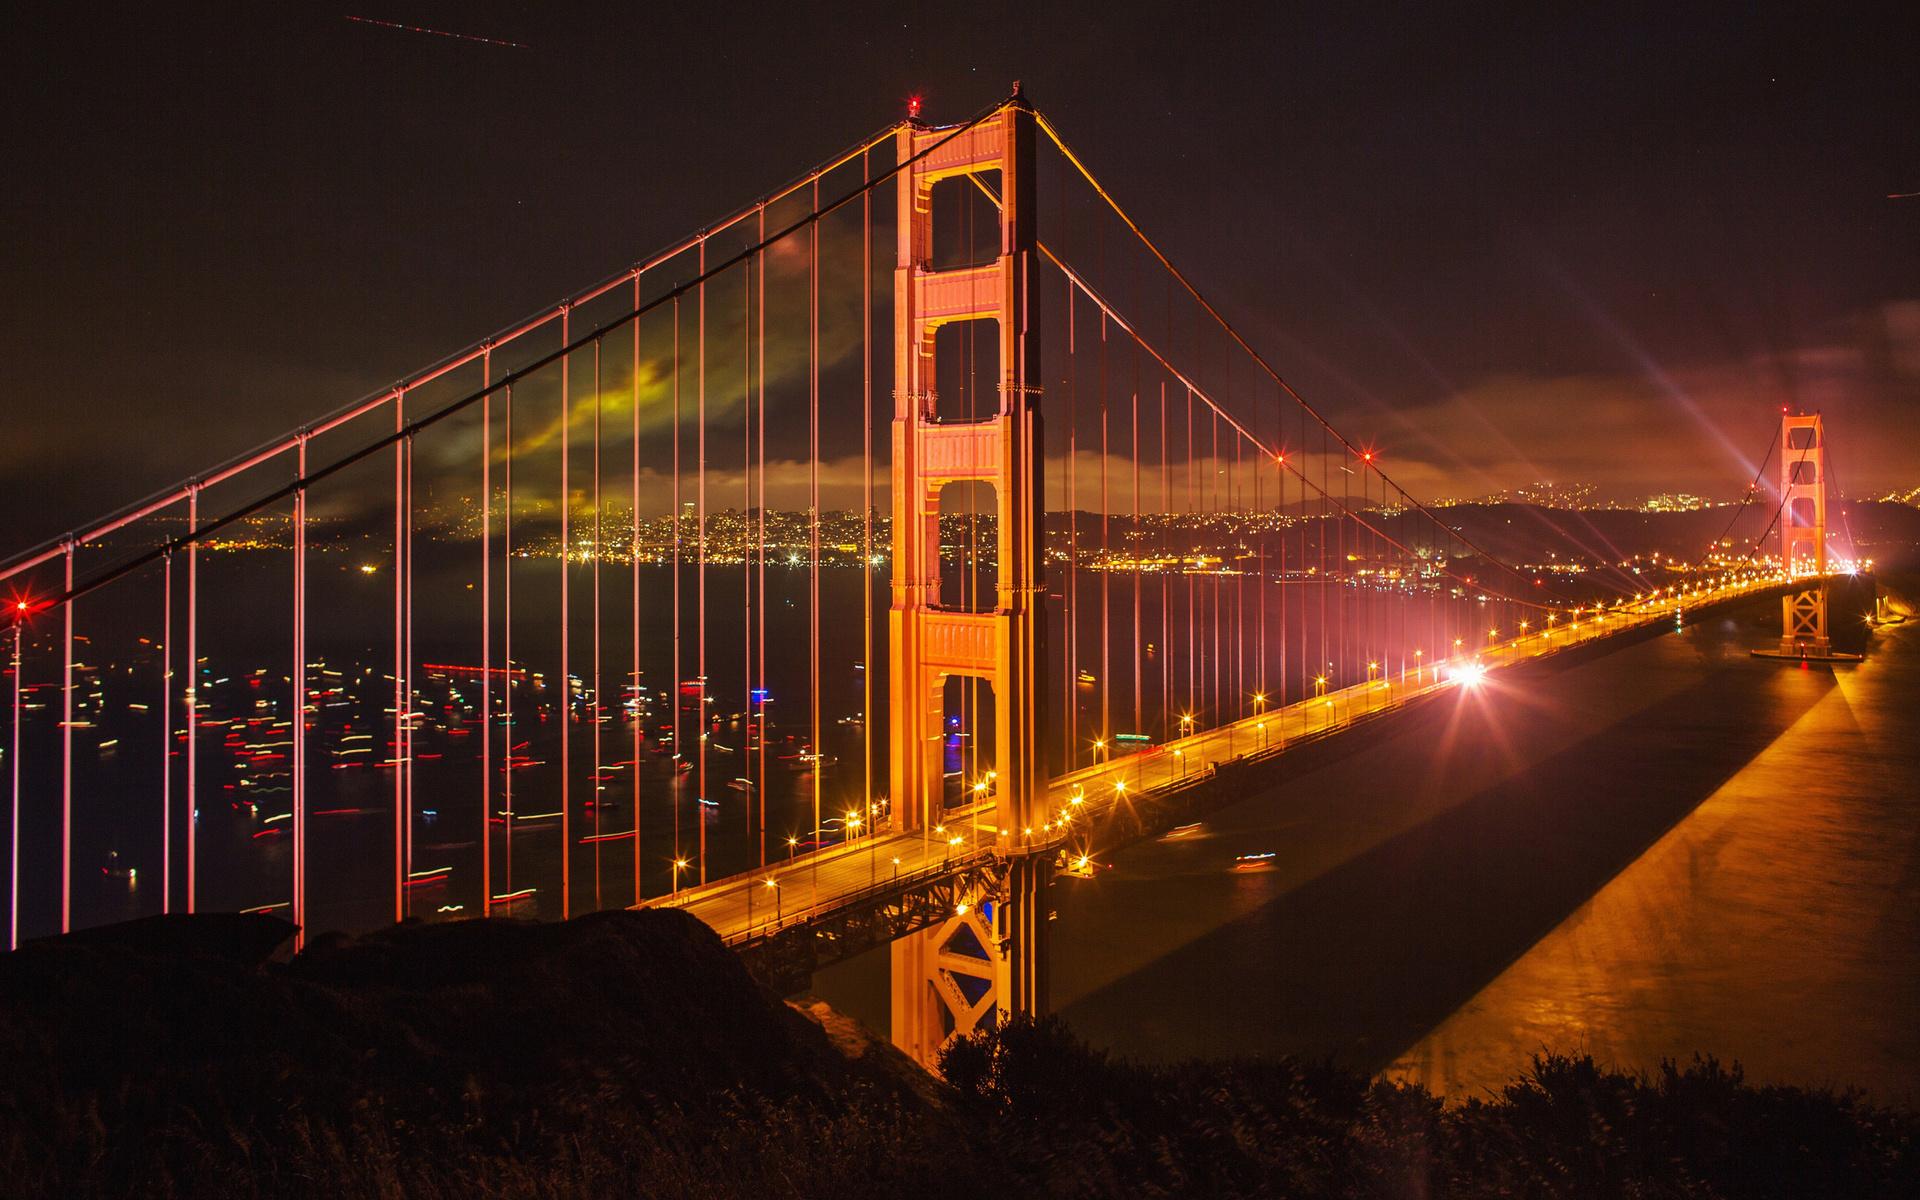 golden gate bridge, evening, night, cityscape, city lights, san francisco